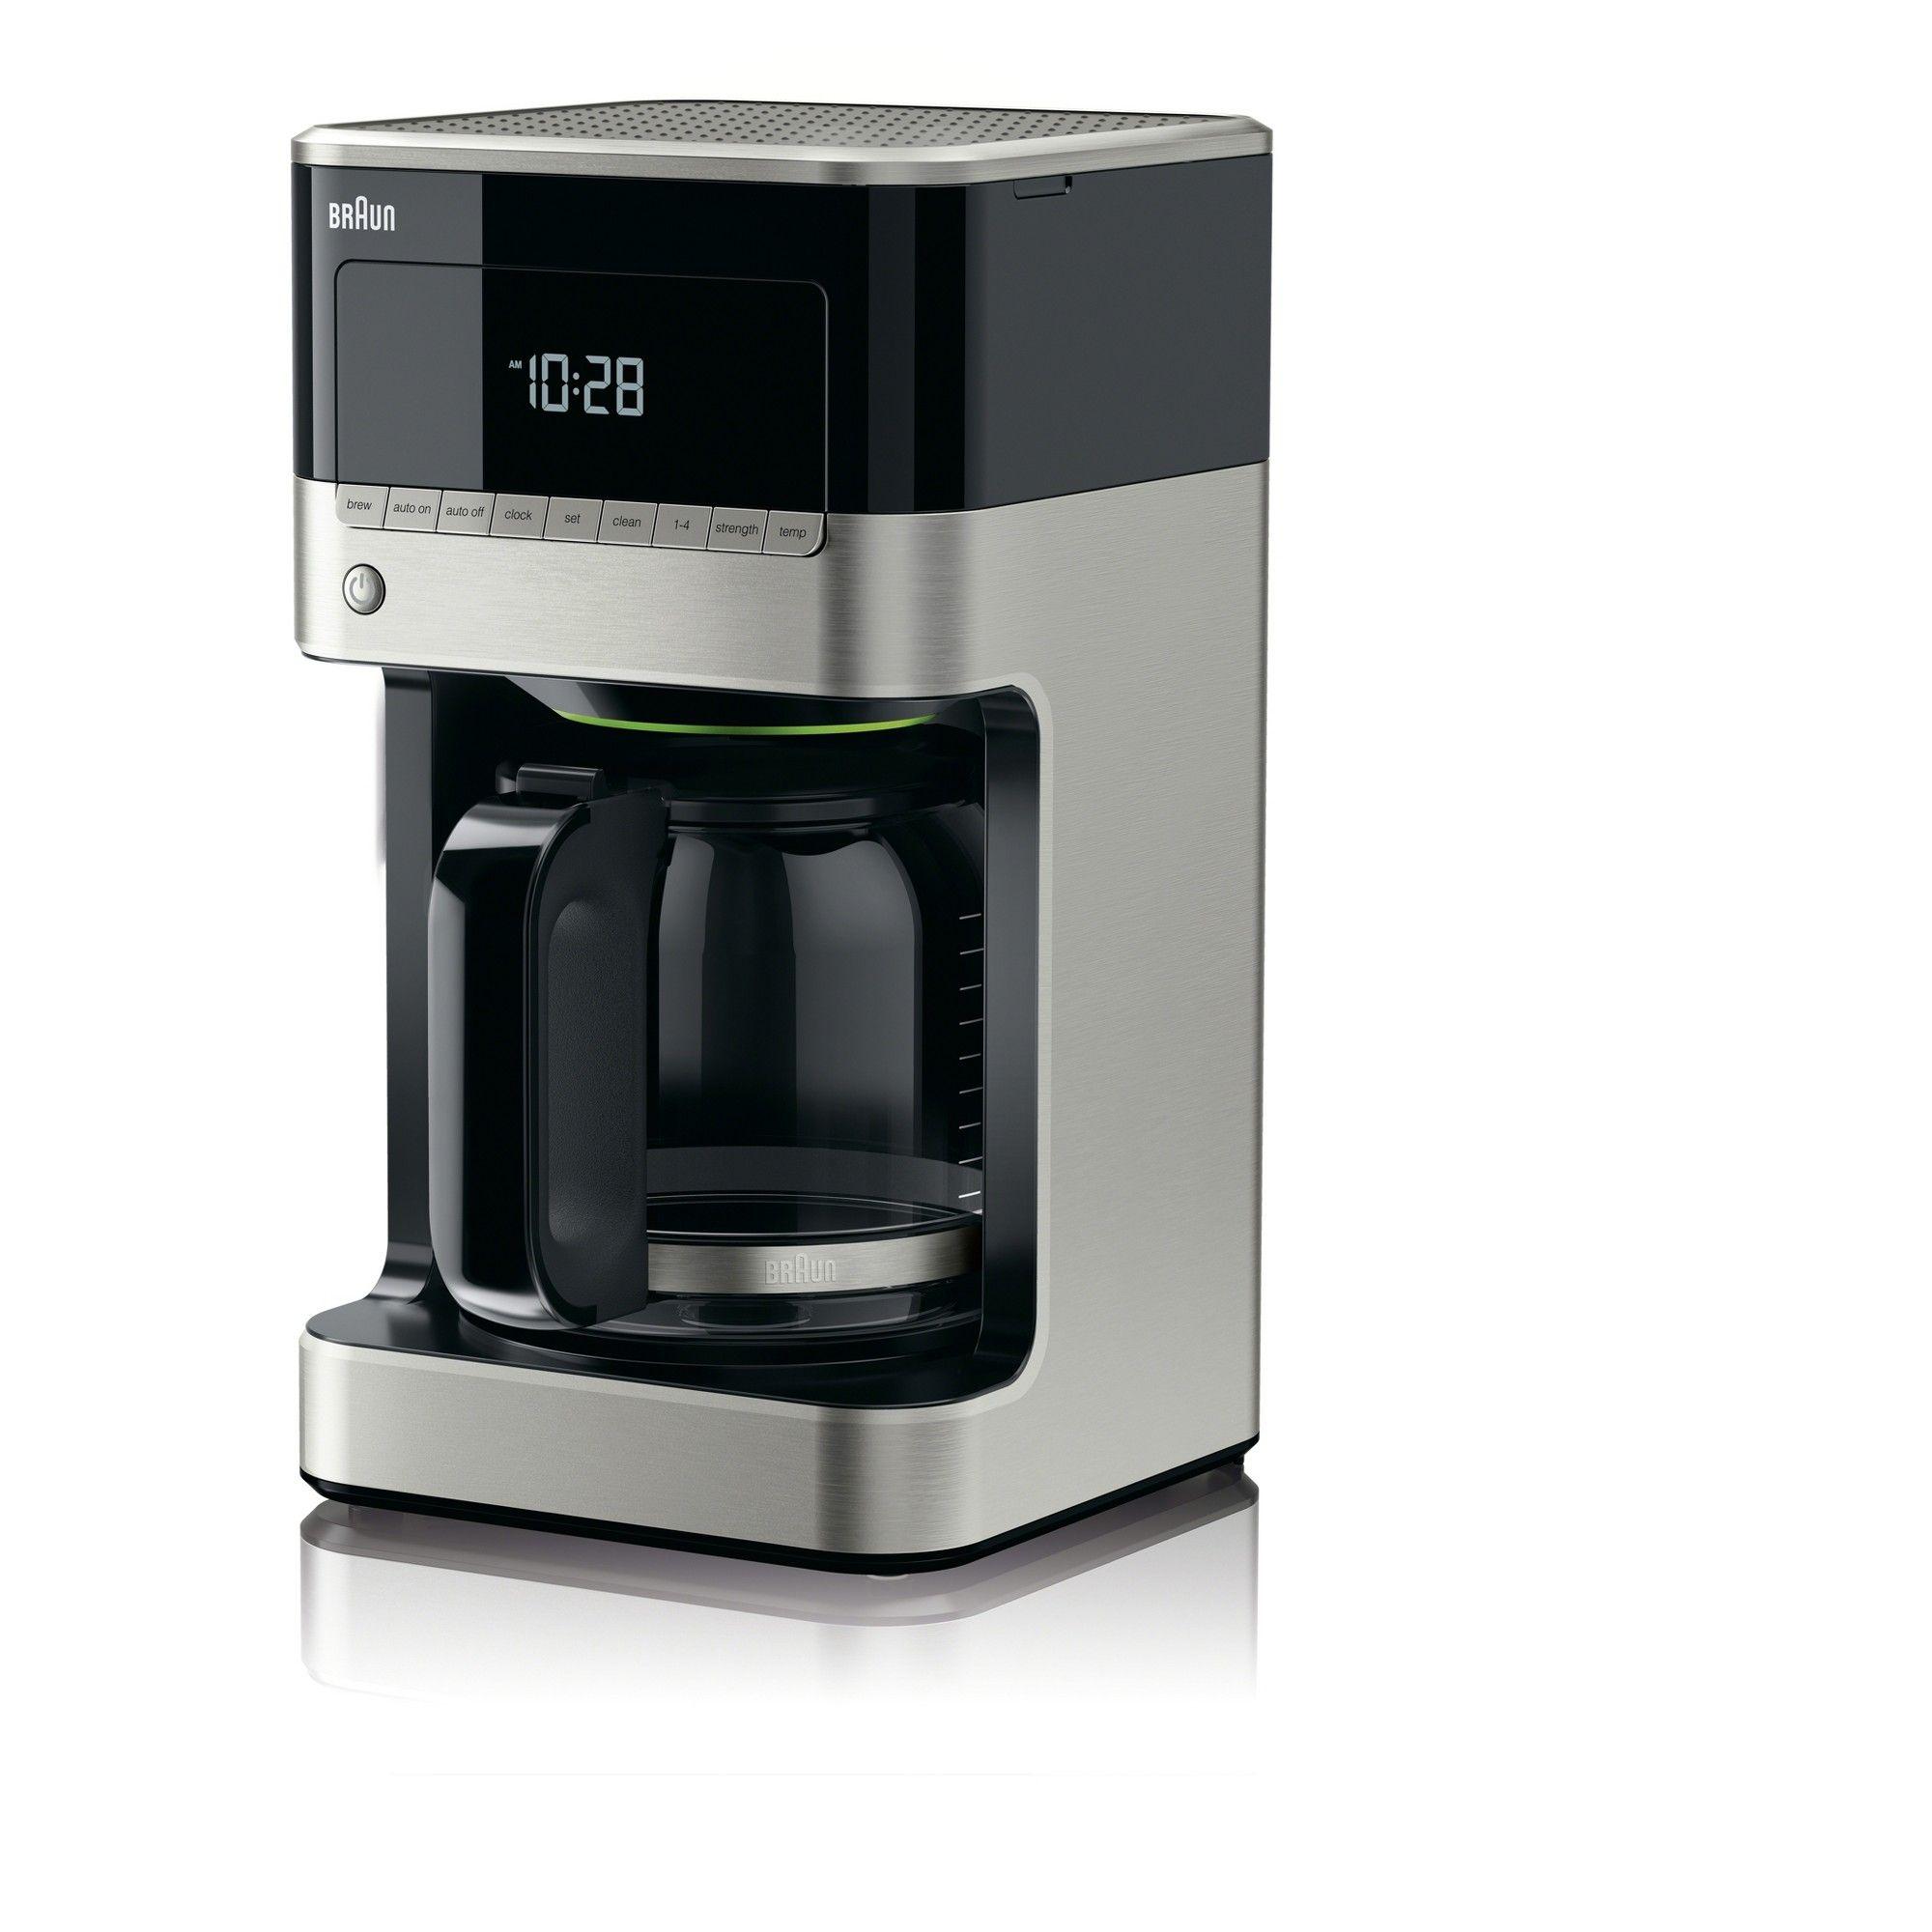 Braun Coffee Maker Stainless Steel & Black, Silver Black